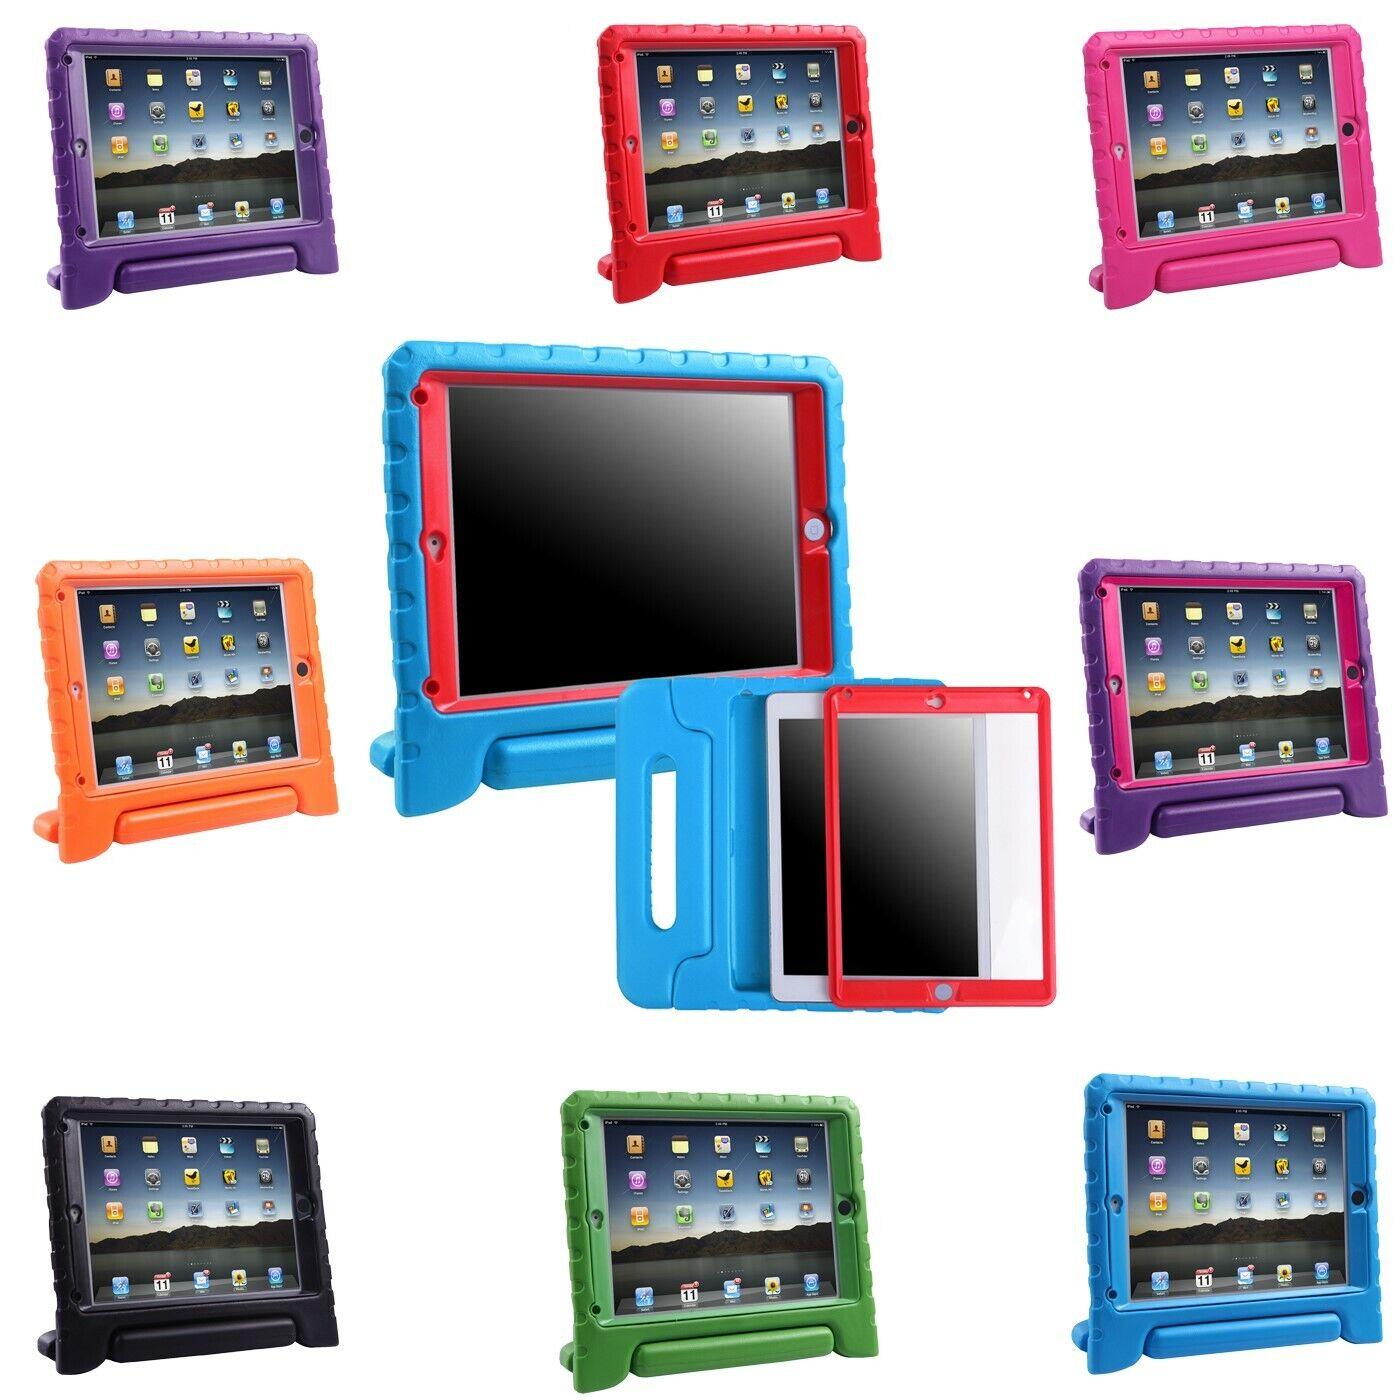 HDE iPad Mini 1 2 3 Bumper Case for Kids Shockproof Hard